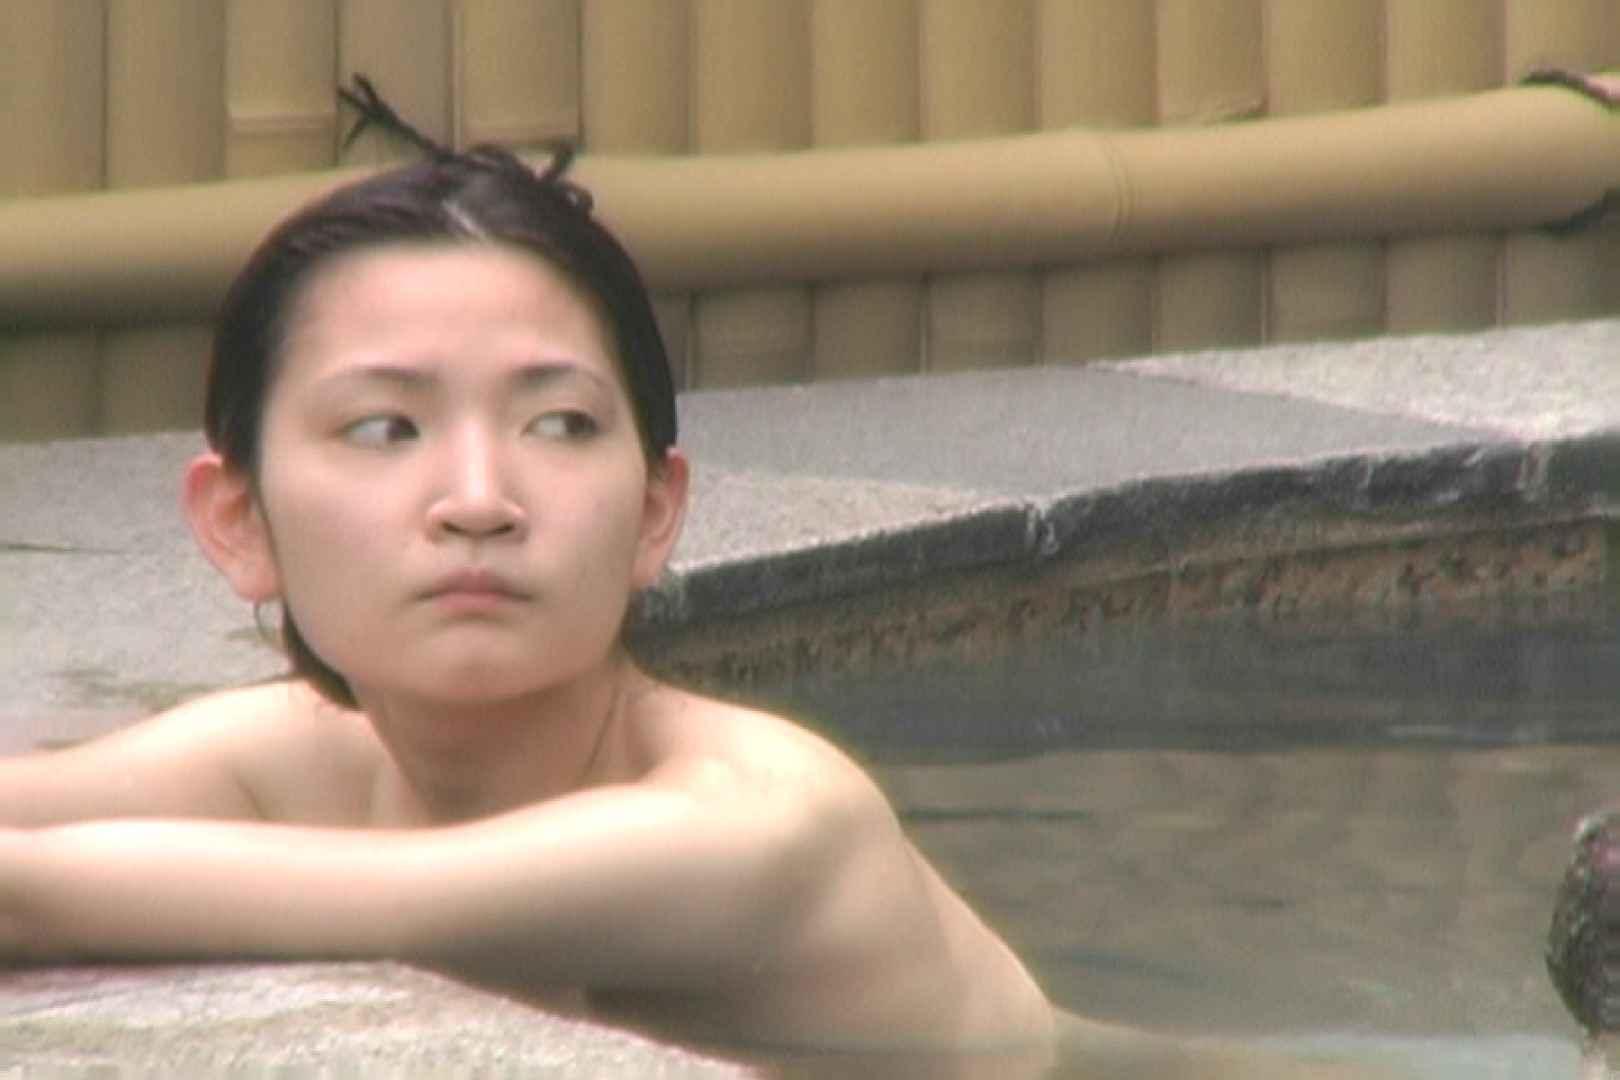 Aquaな露天風呂Vol.637 露天風呂突入 すけべAV動画紹介 81pic 56